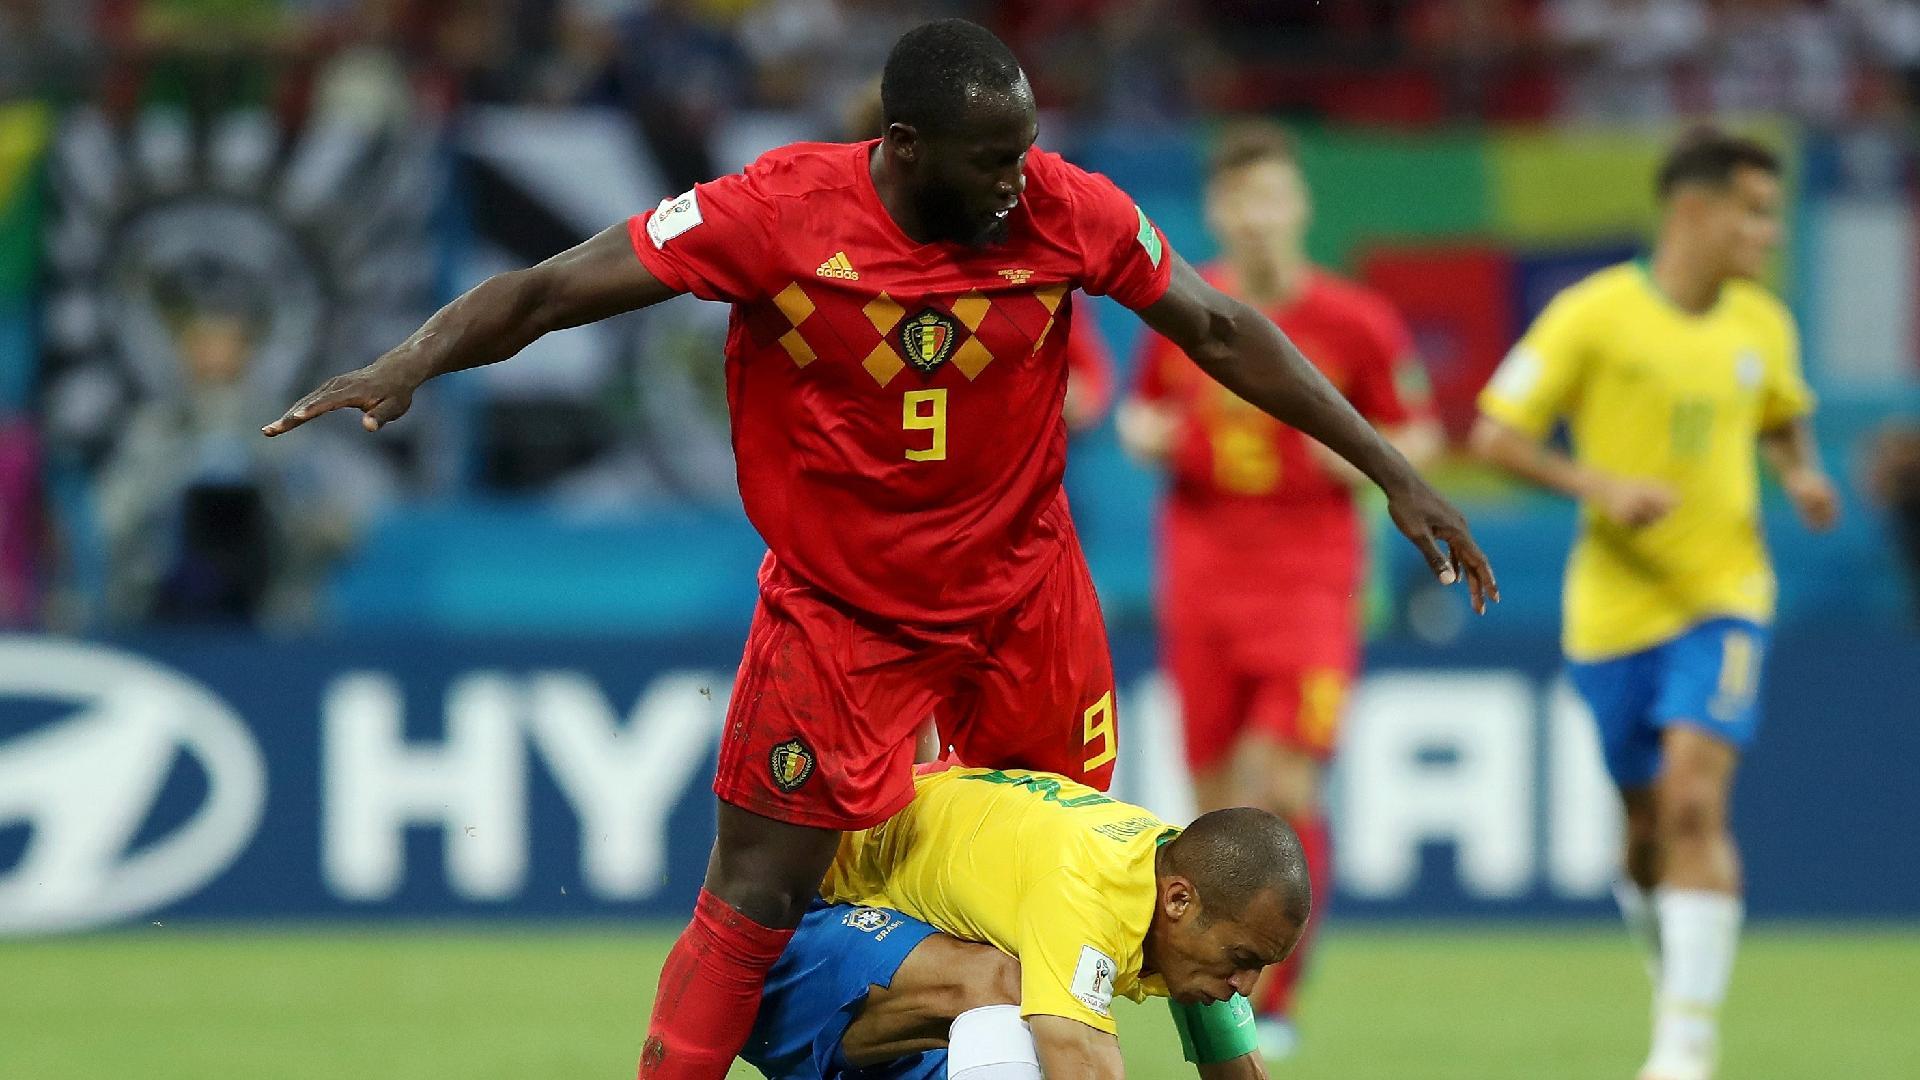 Lukaku Miranda Brasil Bélgica queda